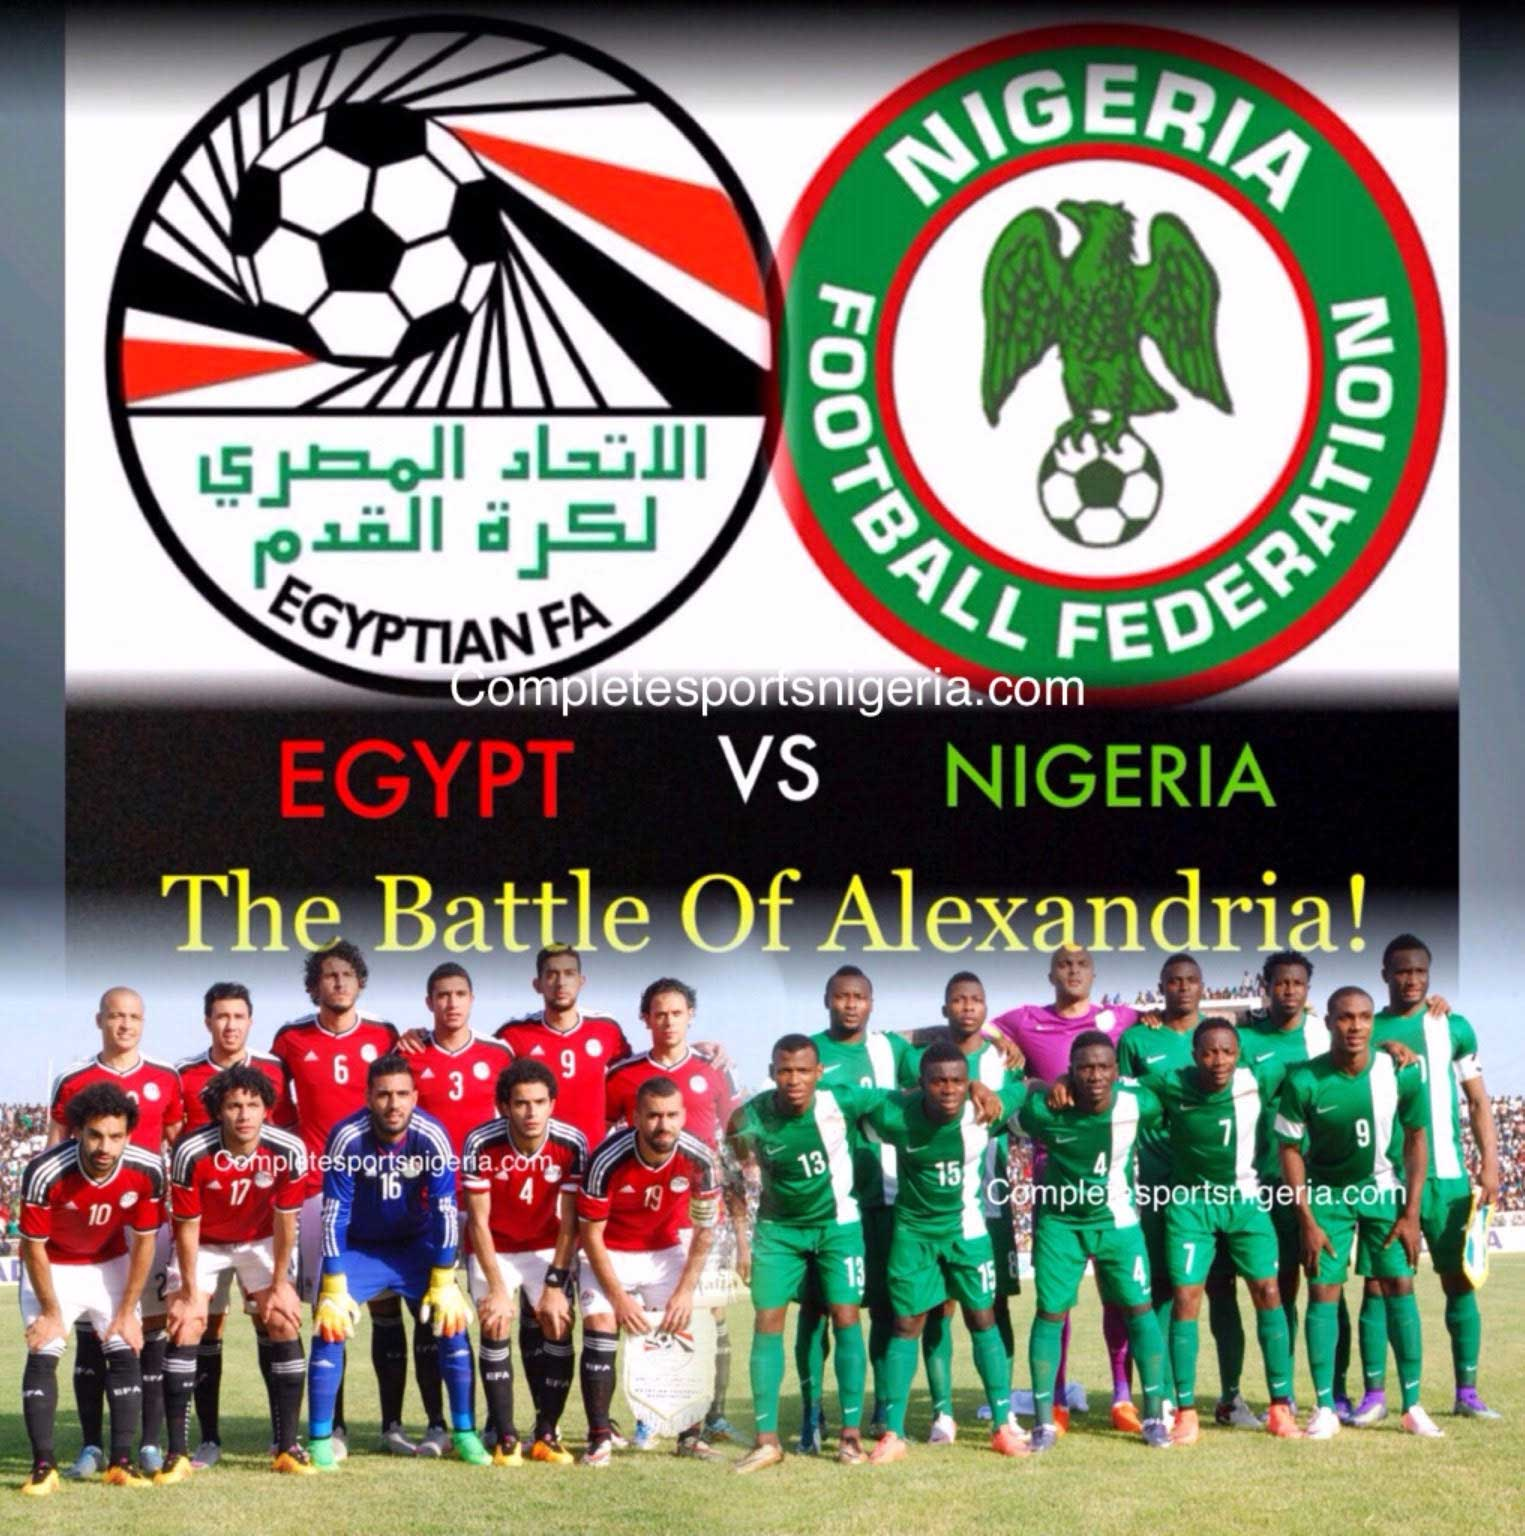 Egypt Vs Nigeria: Minute-By-Minute Live Blogging